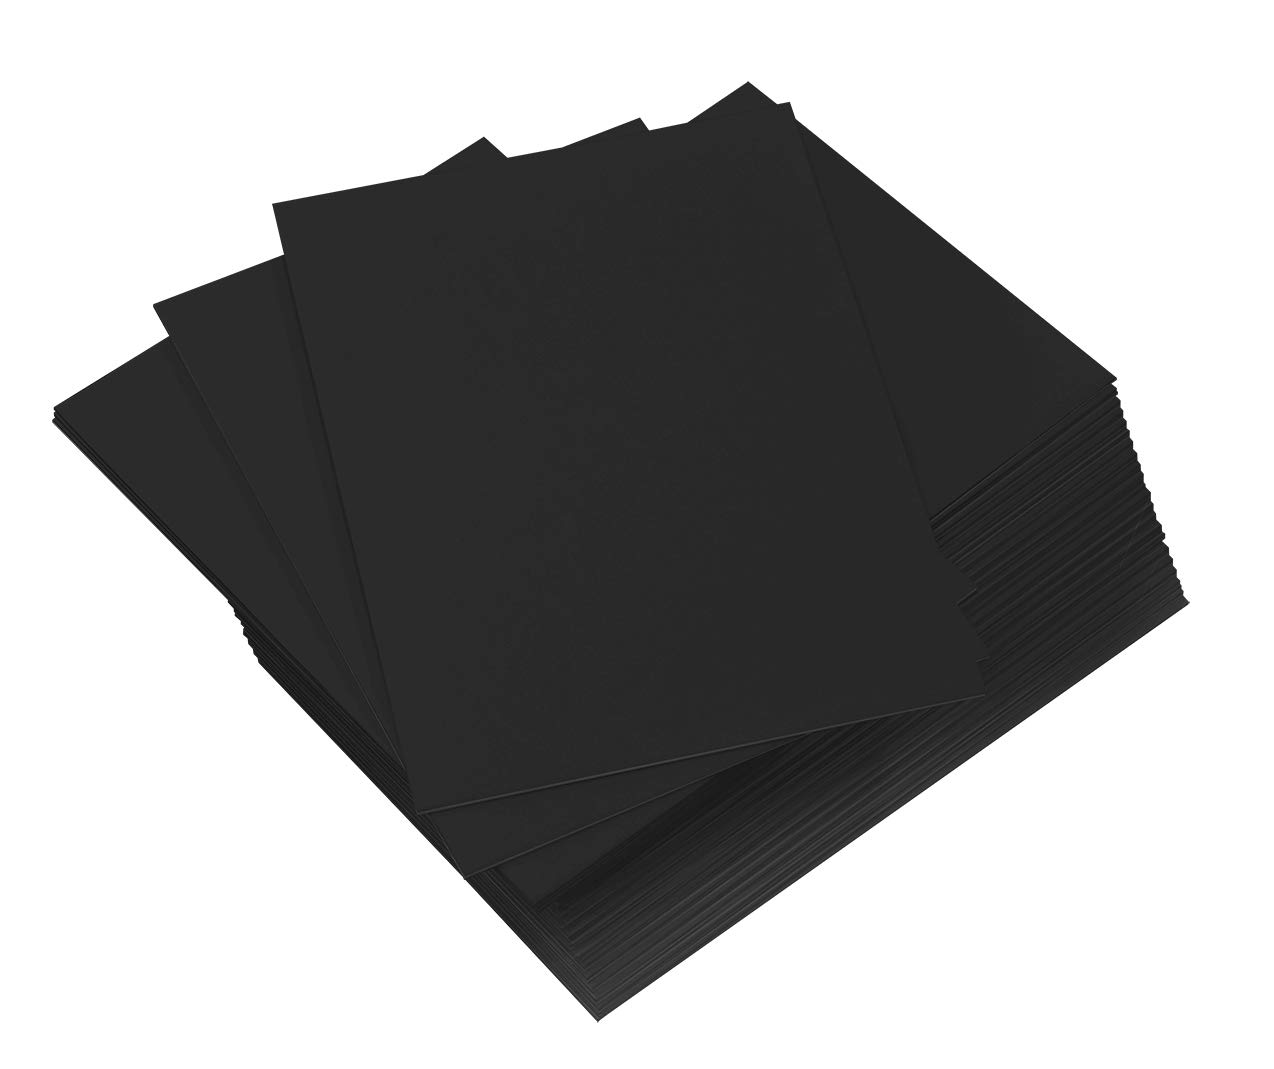 50 16x20 UNCUT mat matboard Black Color by Golden State Art